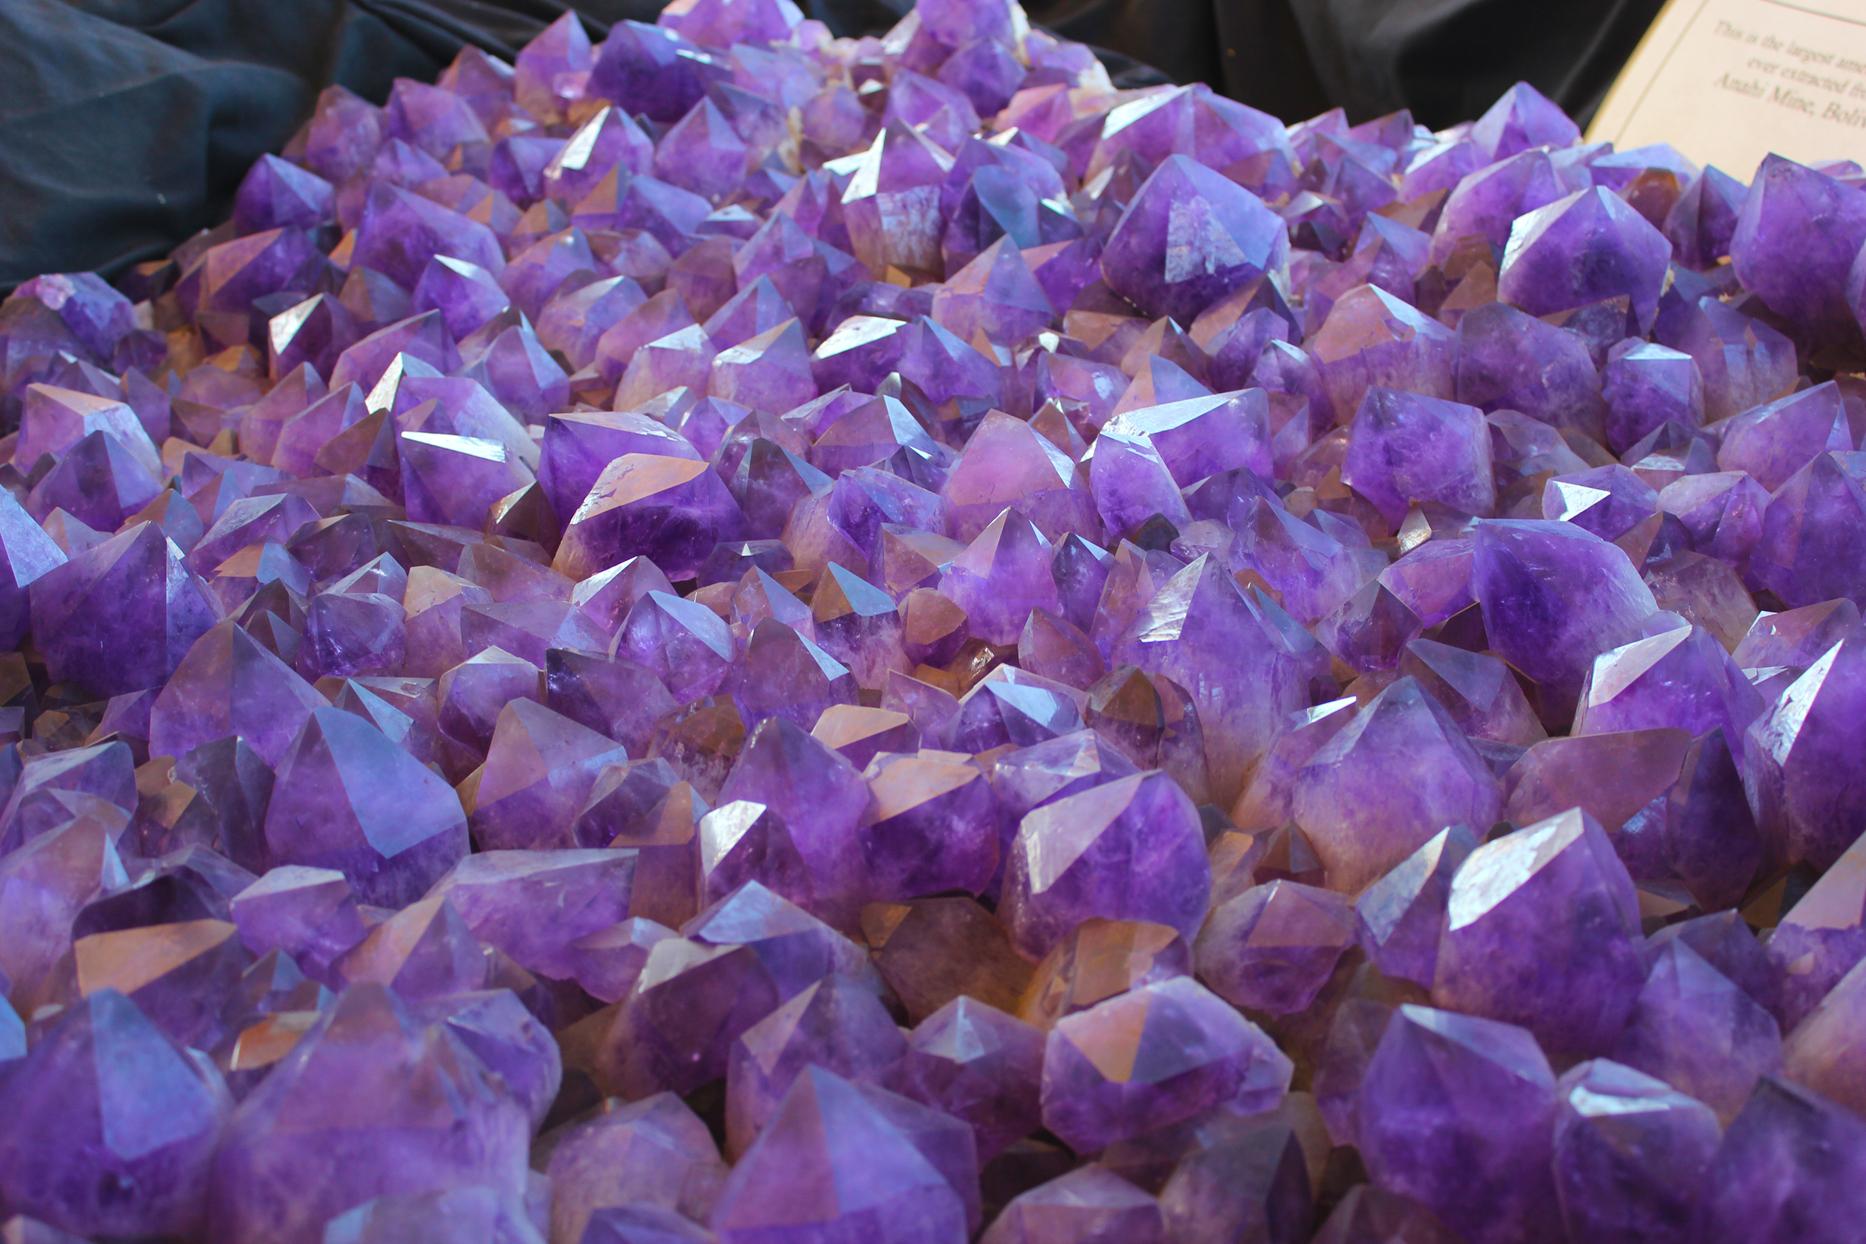 amethyst crystals, Photo courtesy Visit Tucson.